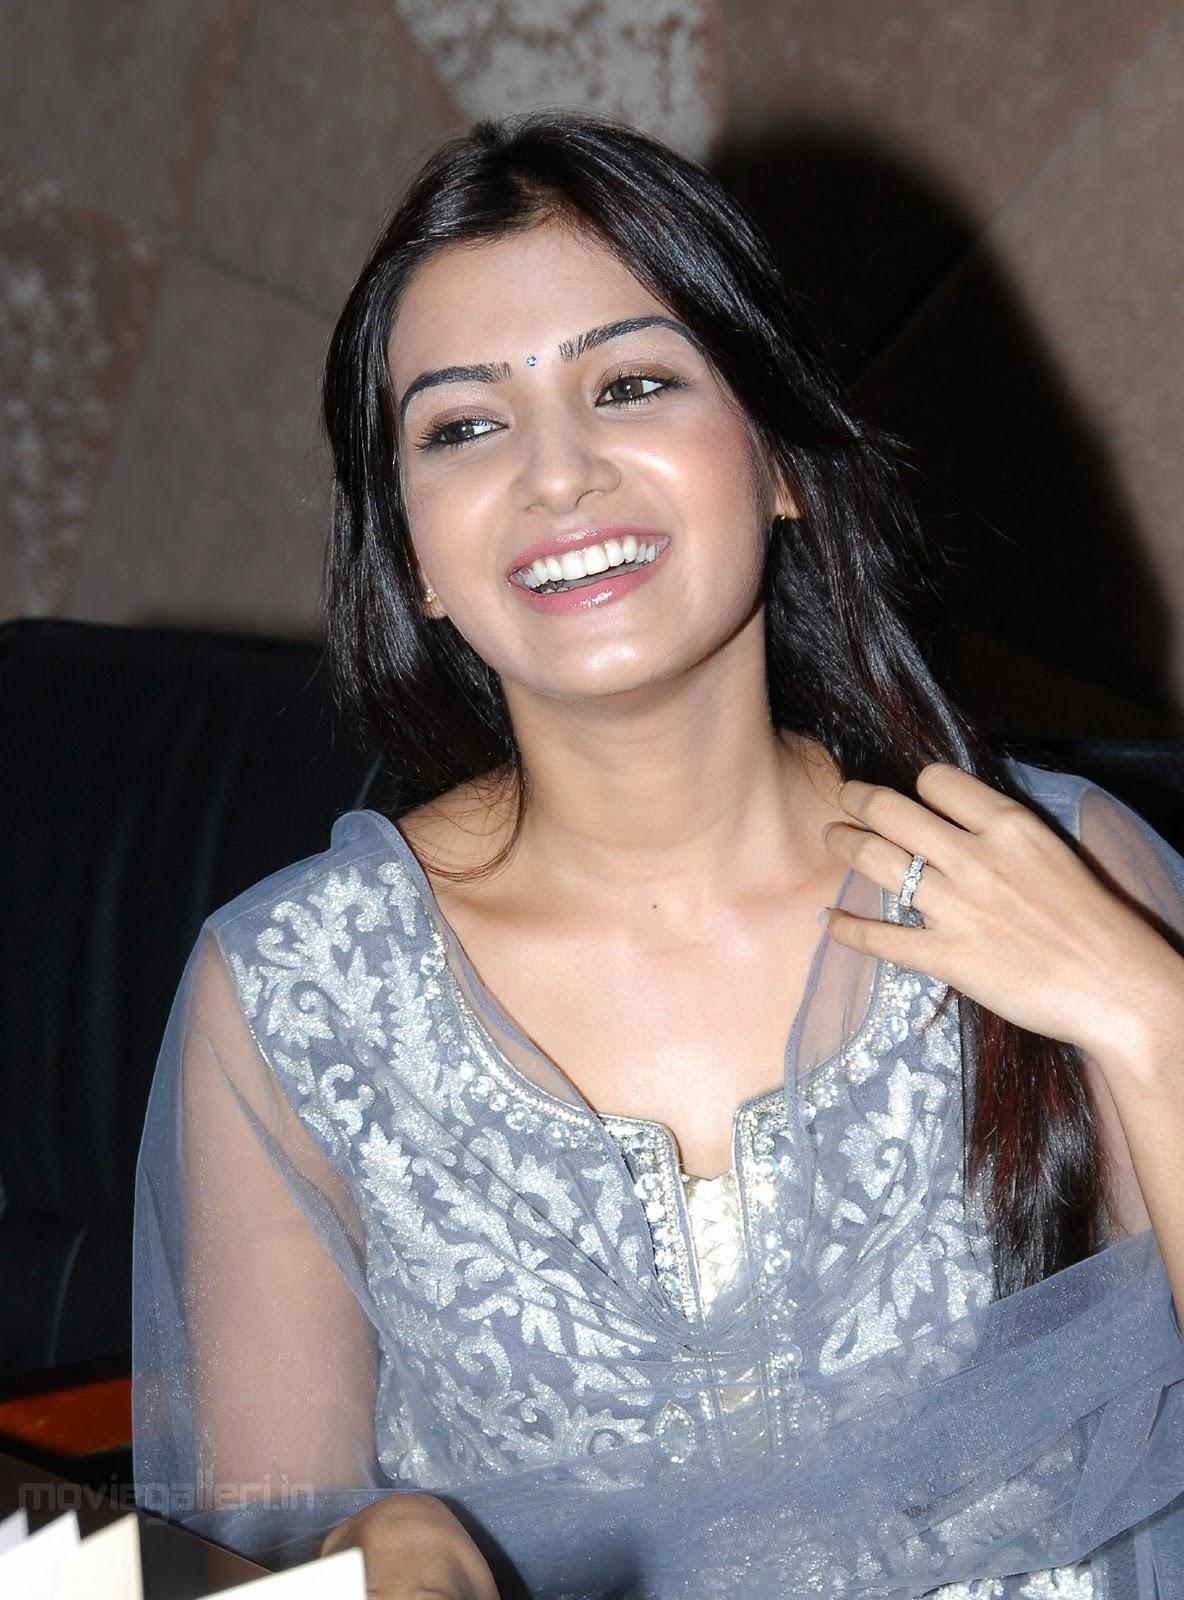 http://3.bp.blogspot.com/_eewr1b1LpYA/TMO8uGq02FI/AAAAAAAAJ10/ZLzmDMYl4bQ/s1600/actress_samantha_cute_smile_stills_wallpapers_06.jpg